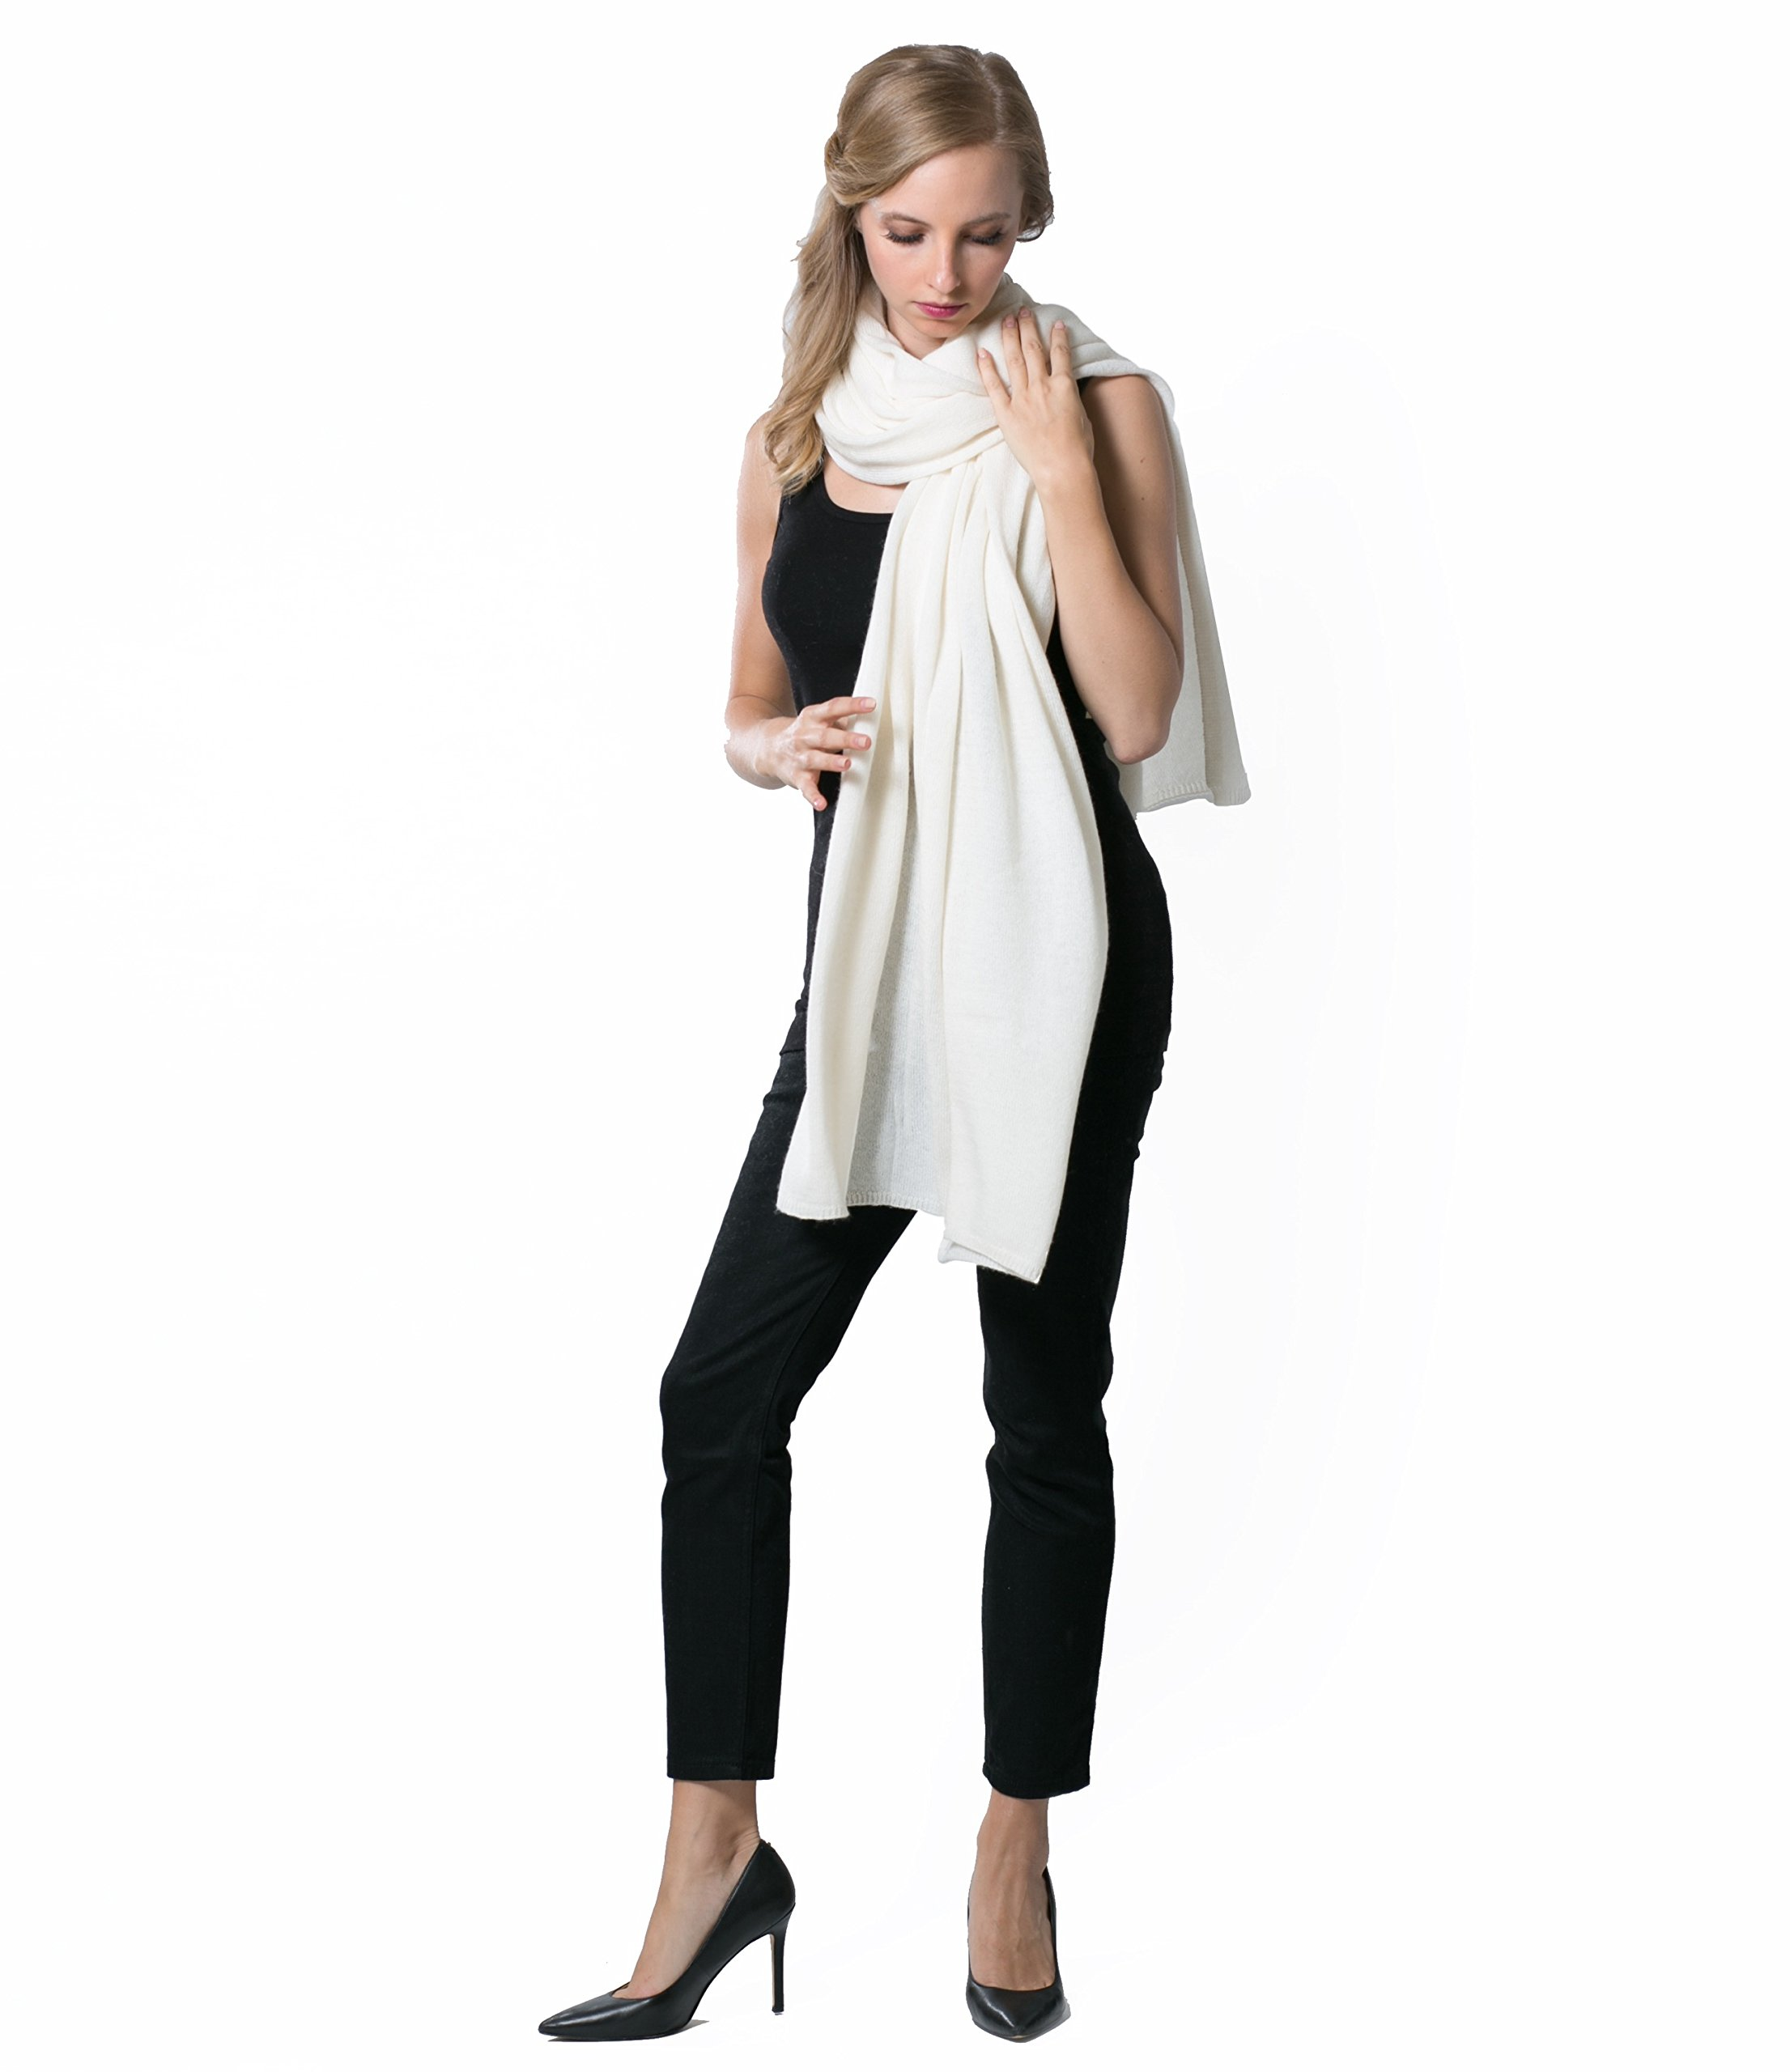 Super Soft Oversized 100% Cashmere Travel Blanket Scarf Wrap - Ivory by Anna Kristine